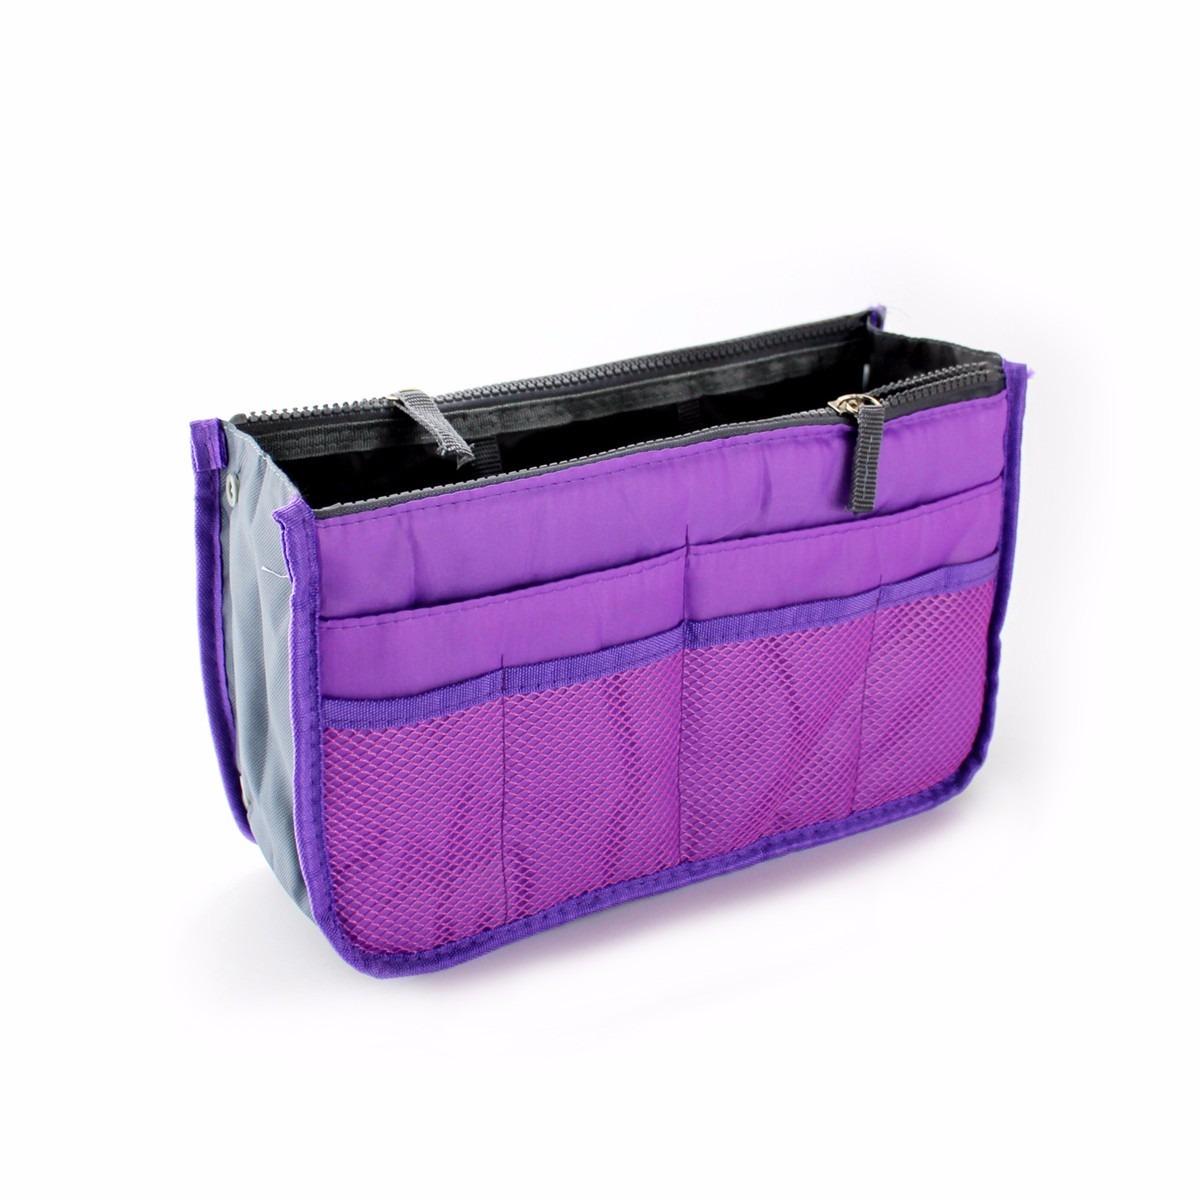 Organizador para carteras y bolsos en mercado - Organizador de carteras ...